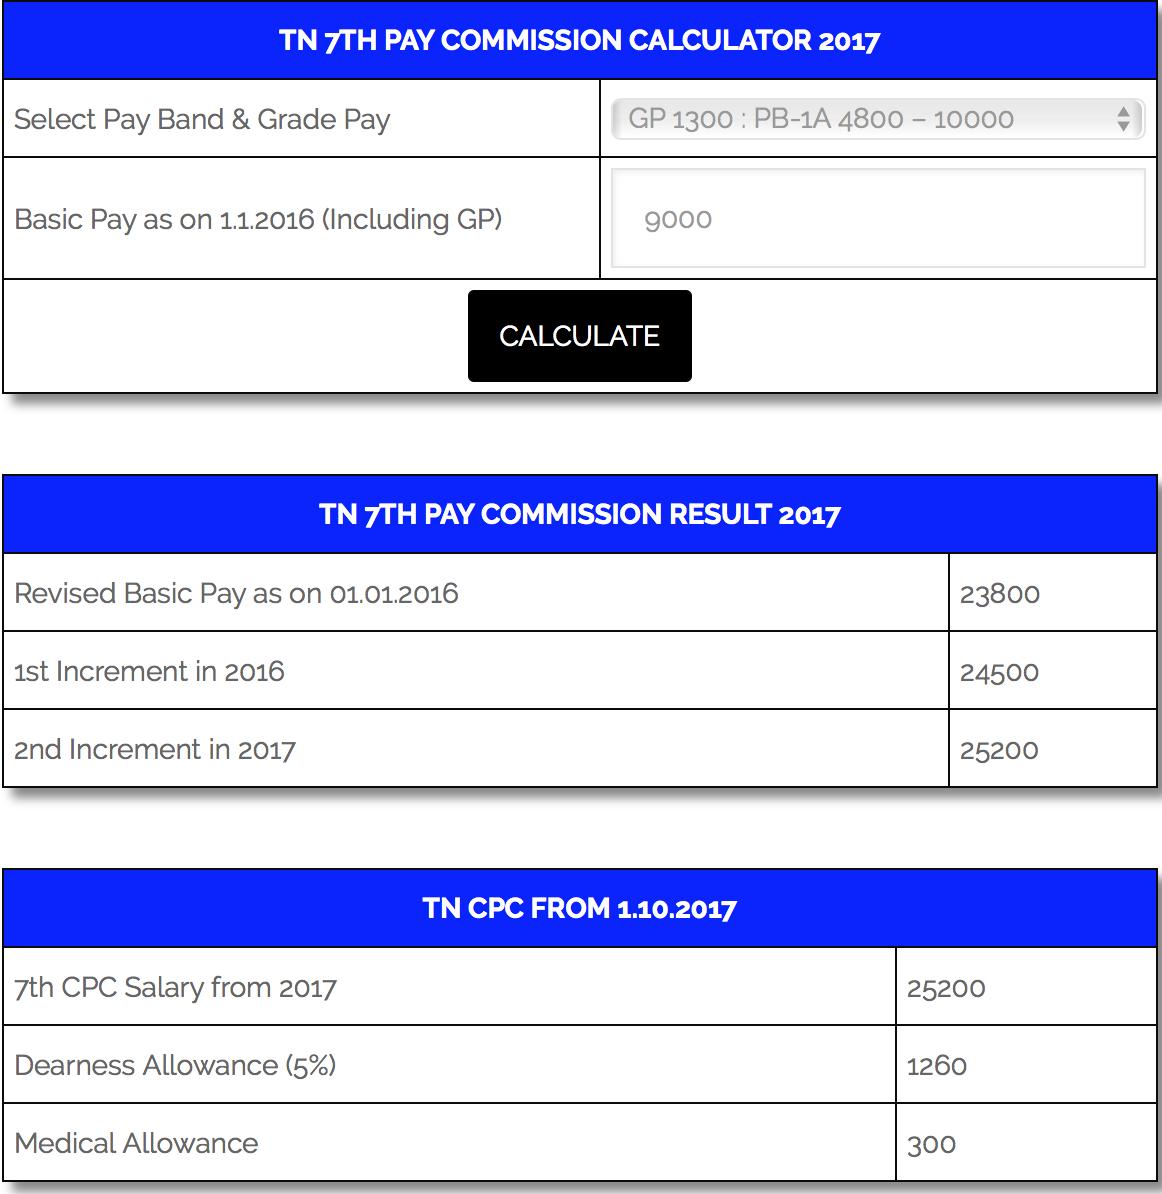 Latest Tamilnadu 7th Pay Commission Salary Calculator | 7th